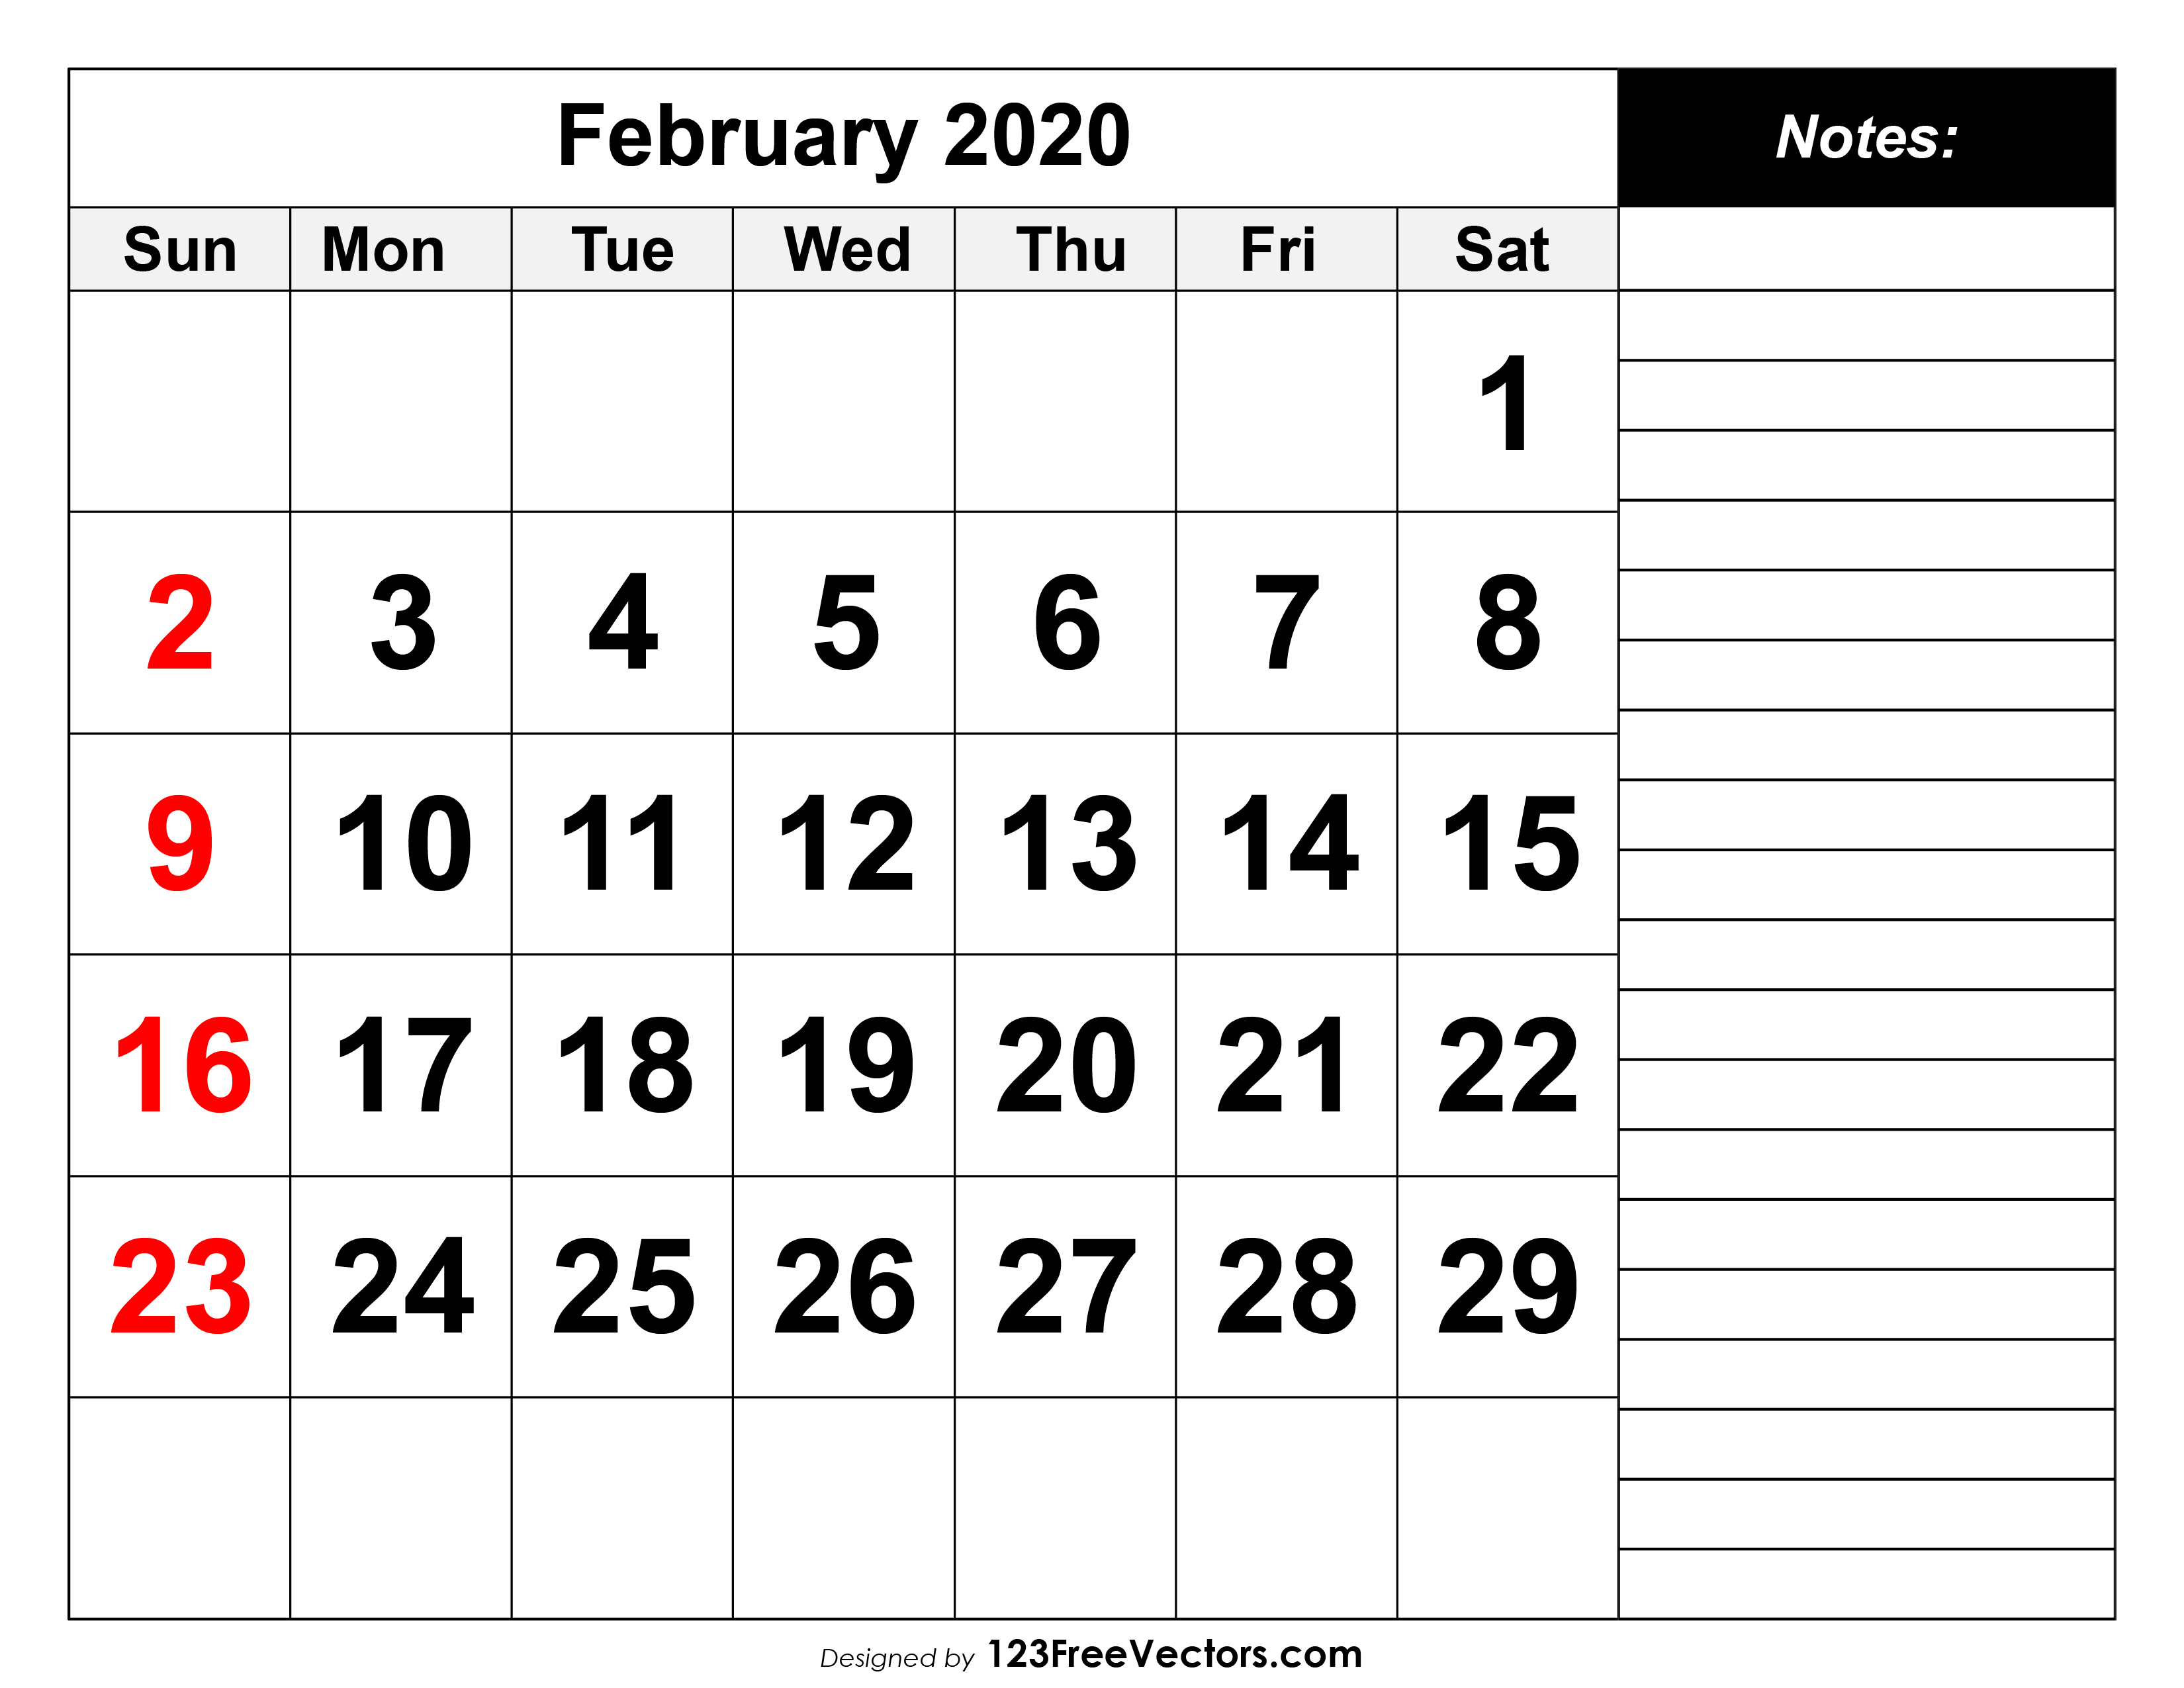 February 2020 Printable Calendar throughout Feb 2020 Calendar